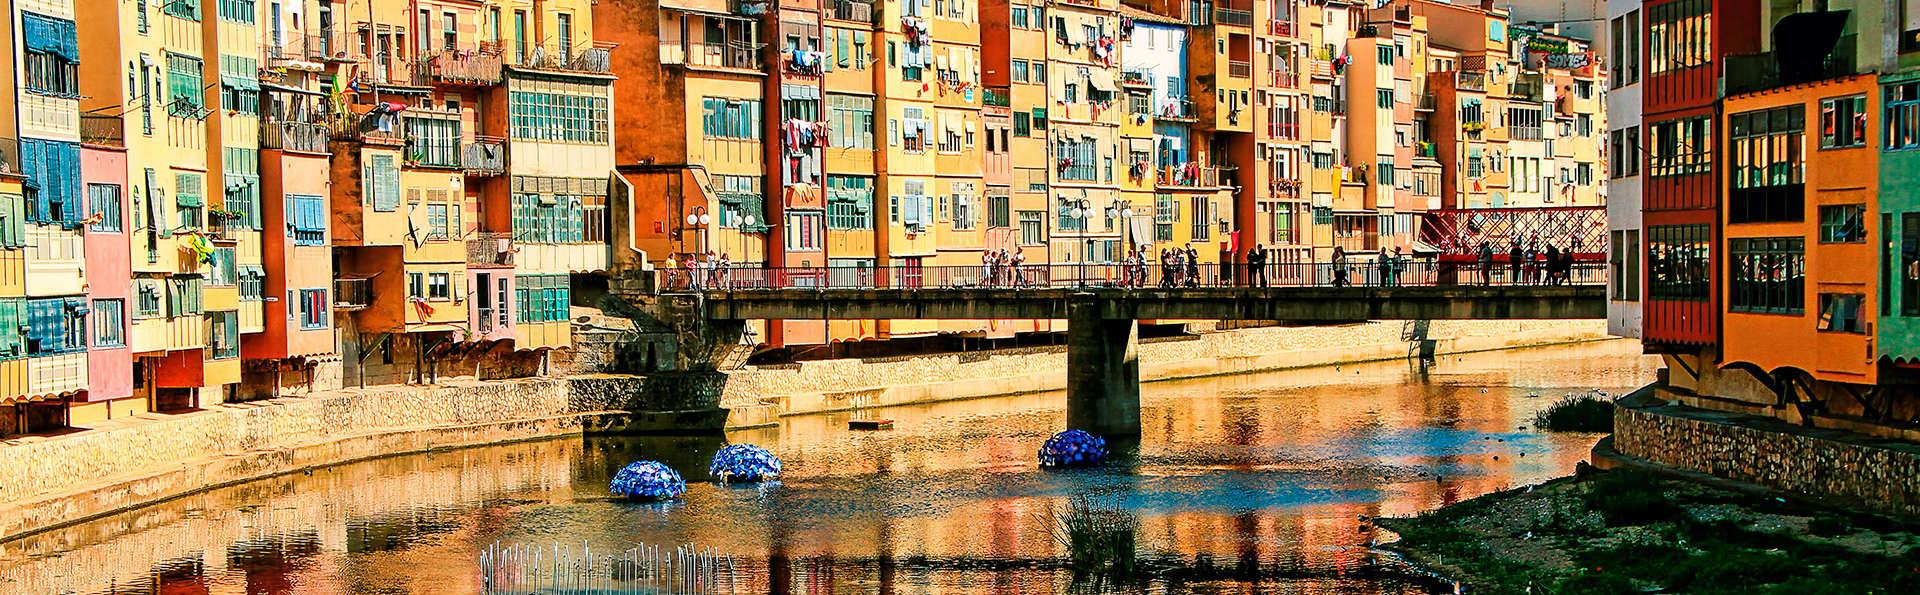 AC Hotel Palau de Bellavista Girona - edit_girona.jpg